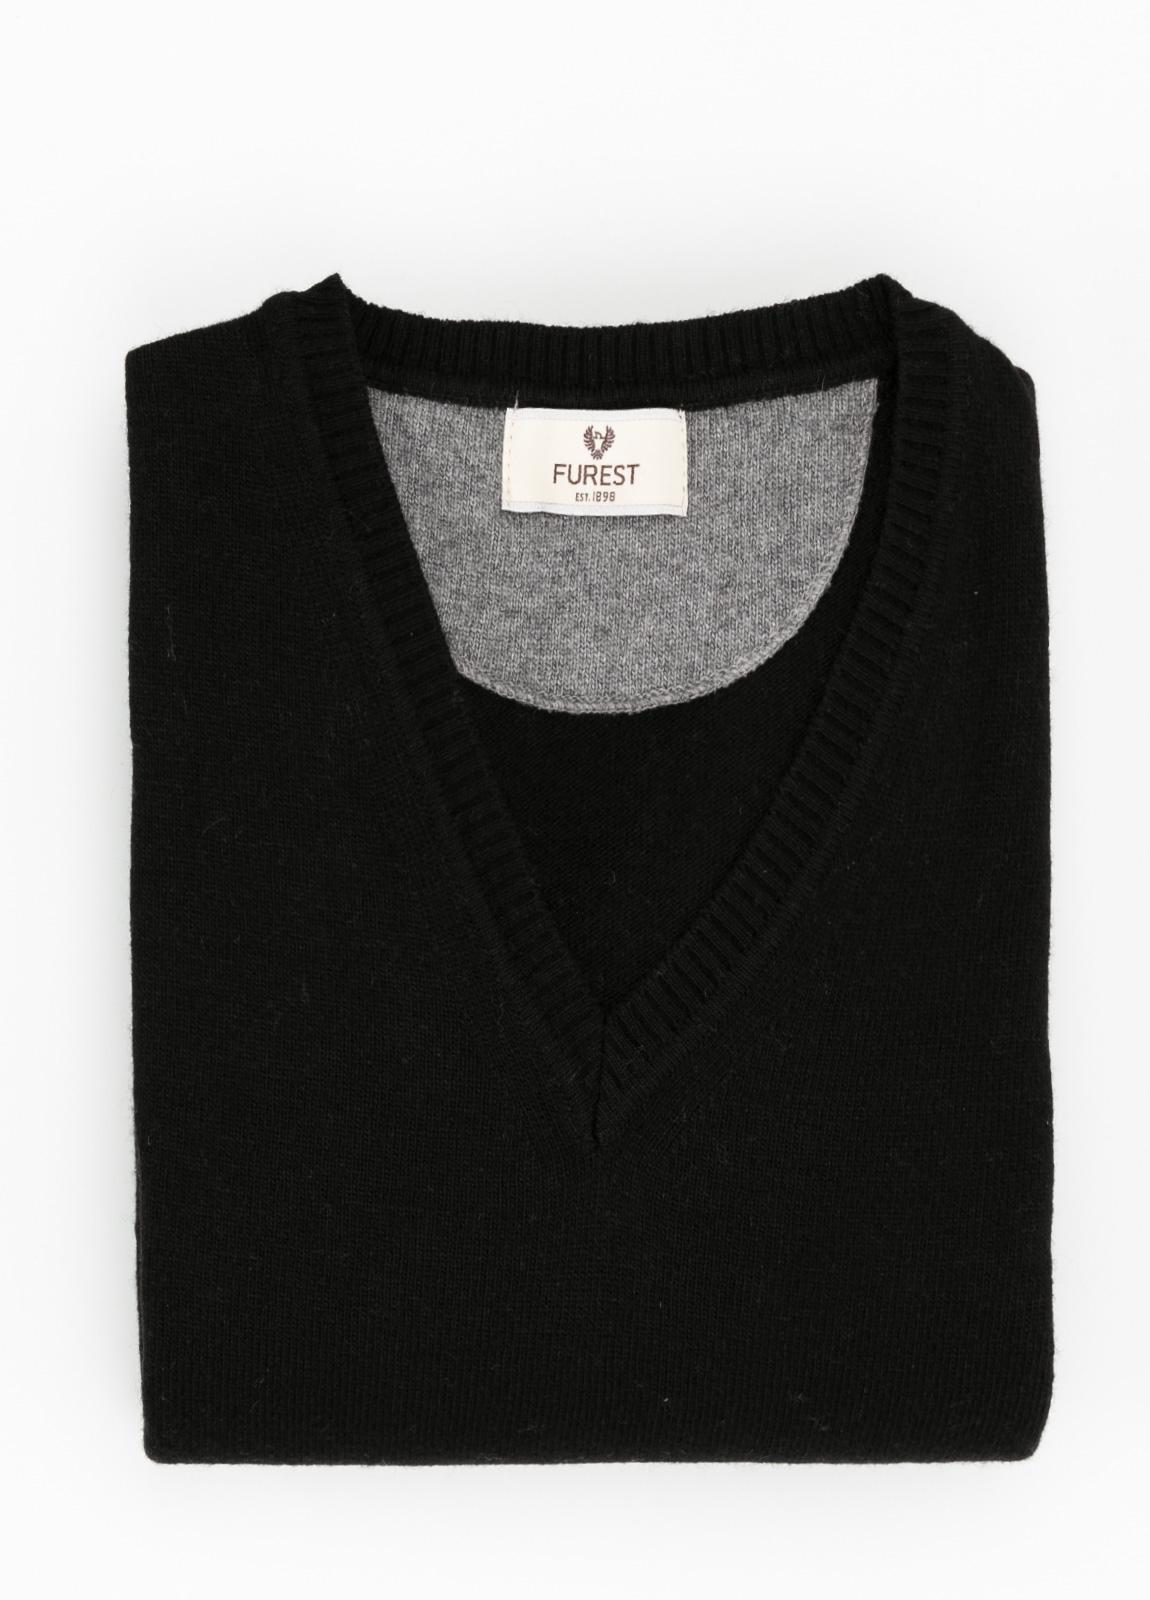 Jersey liso cuello pico color negro, 40% lana merino, 20% viscosa, 10% cachemire - Ítem1